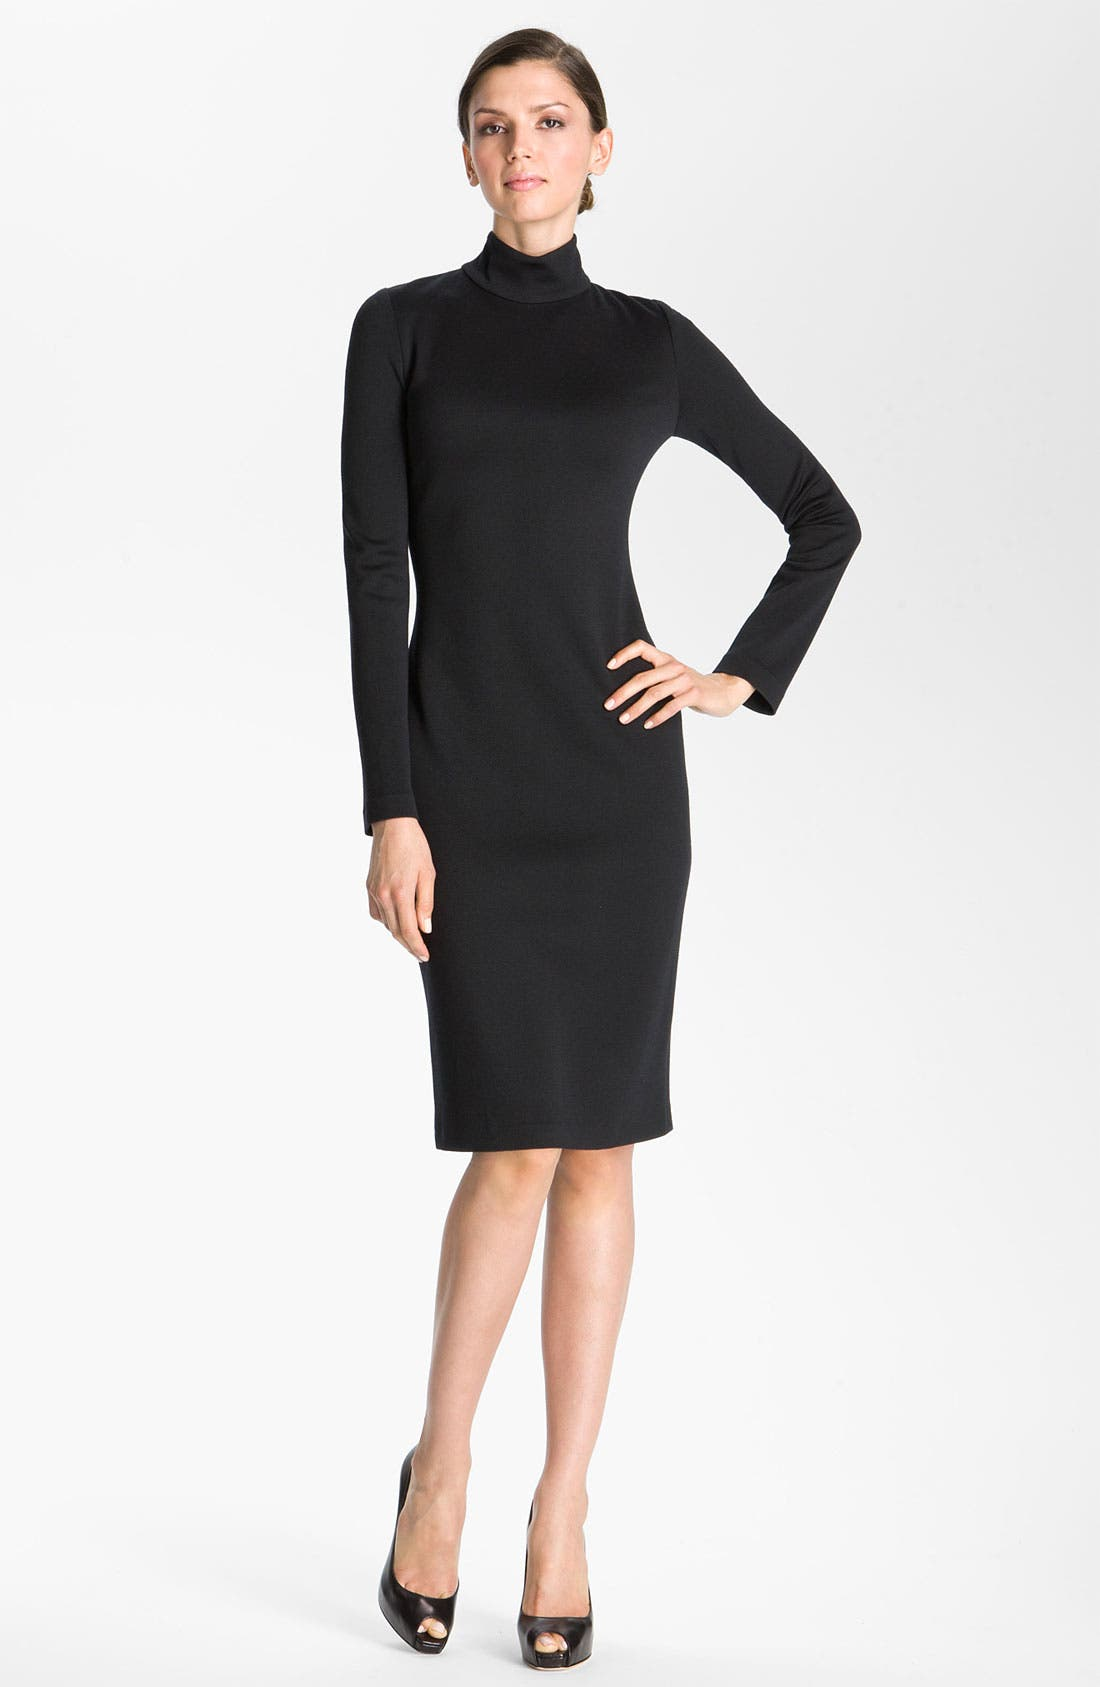 Main Image - St. John Collection Milano Knit Turtleneck Dress